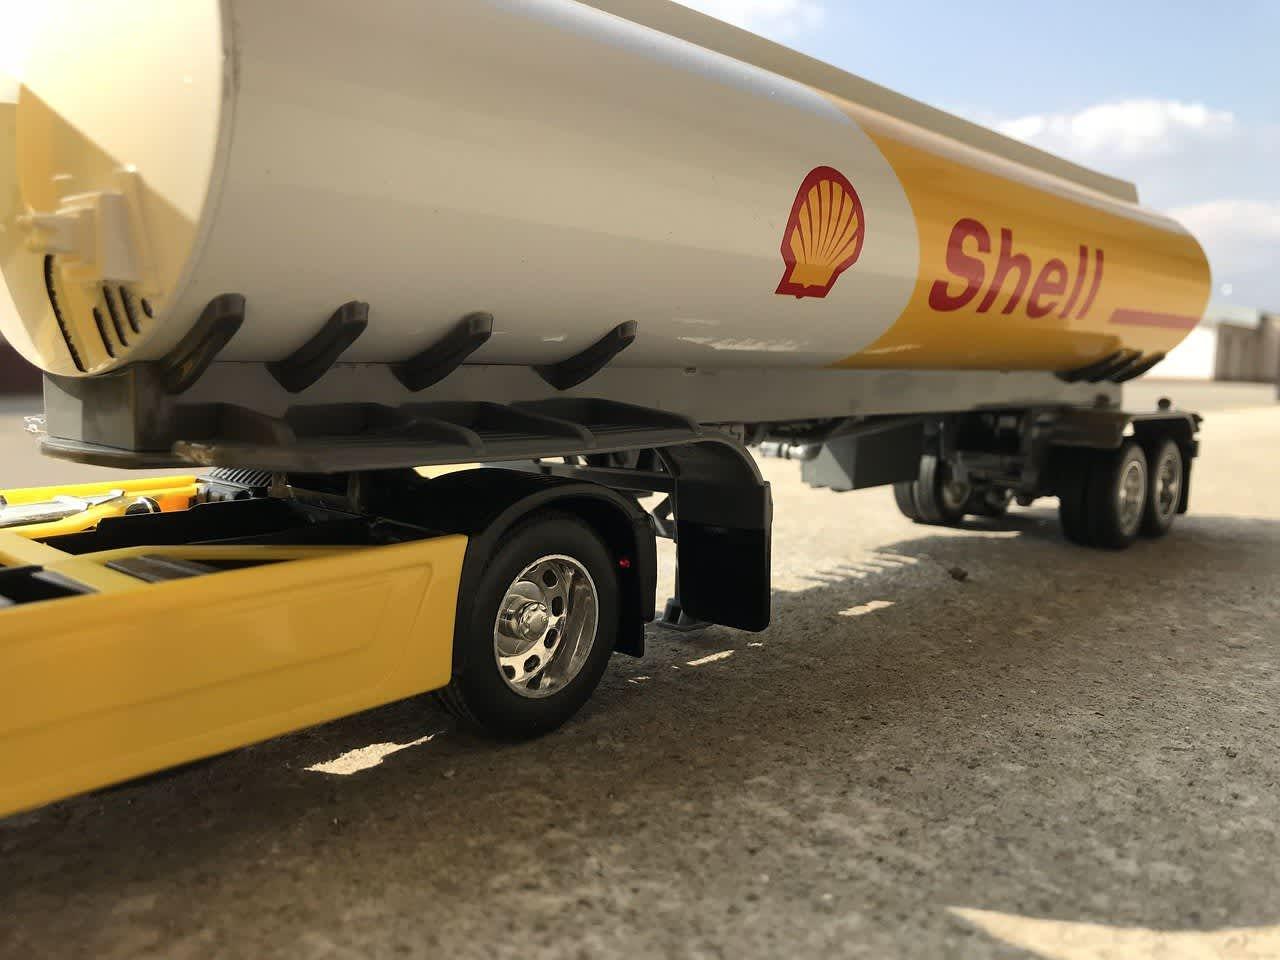 A Shell fuel tanker